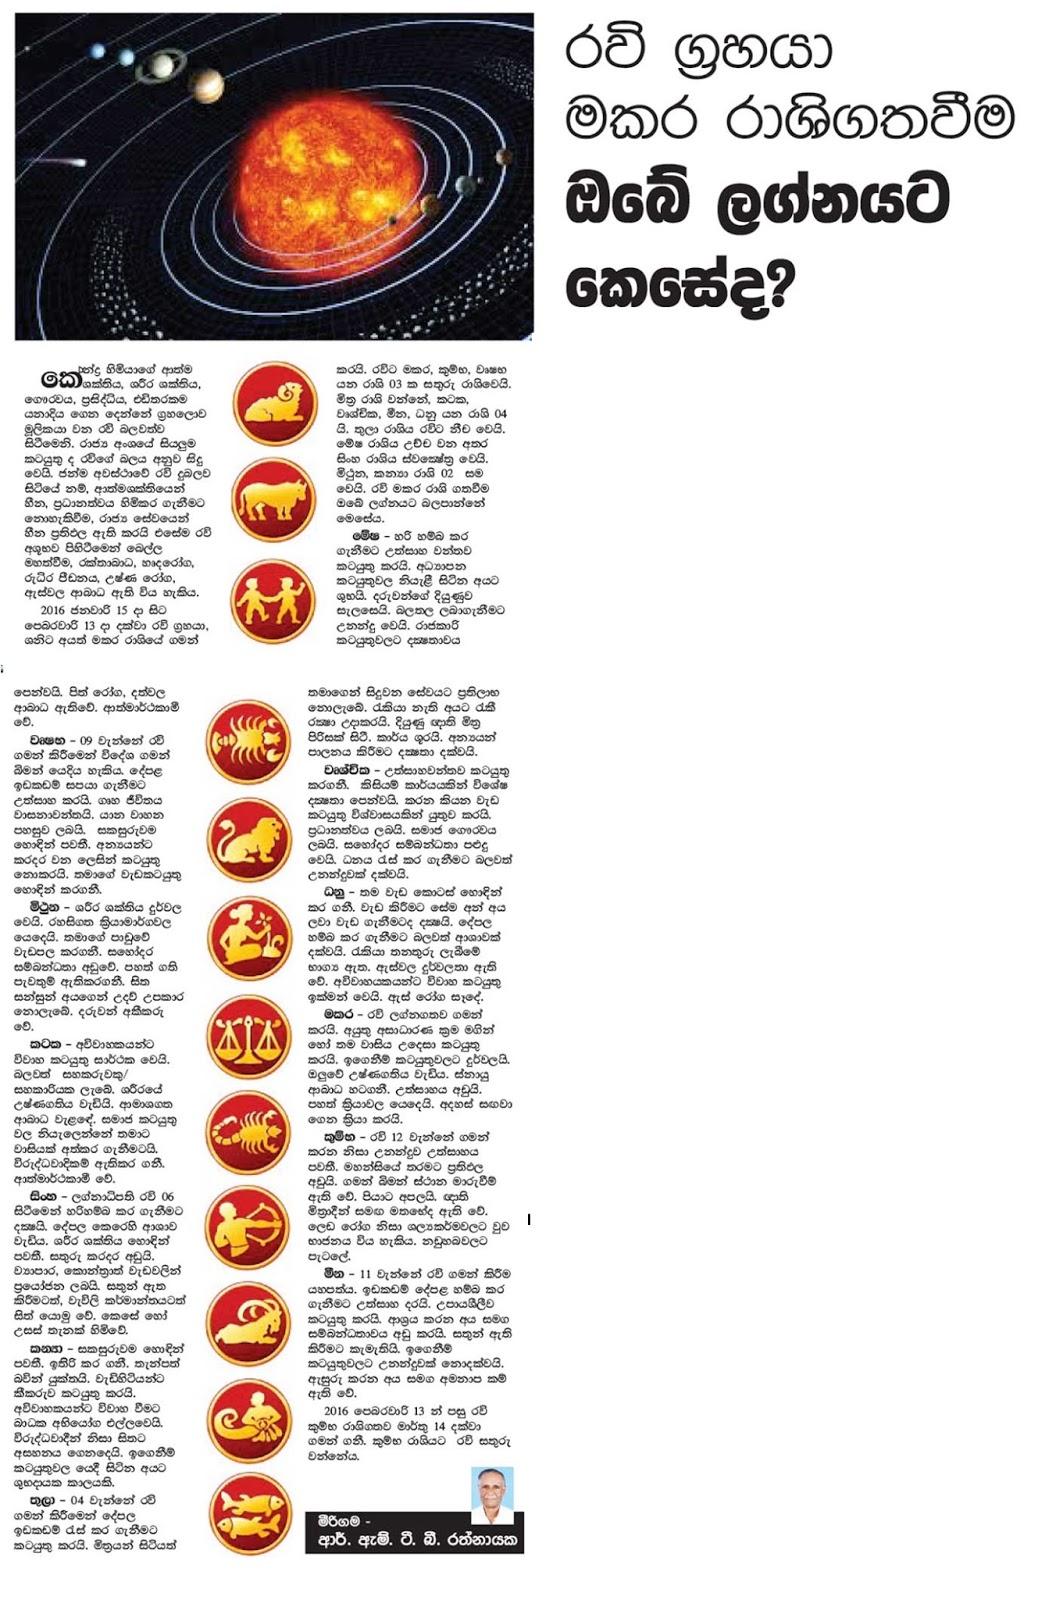 Match horoscope online sri lanka reading